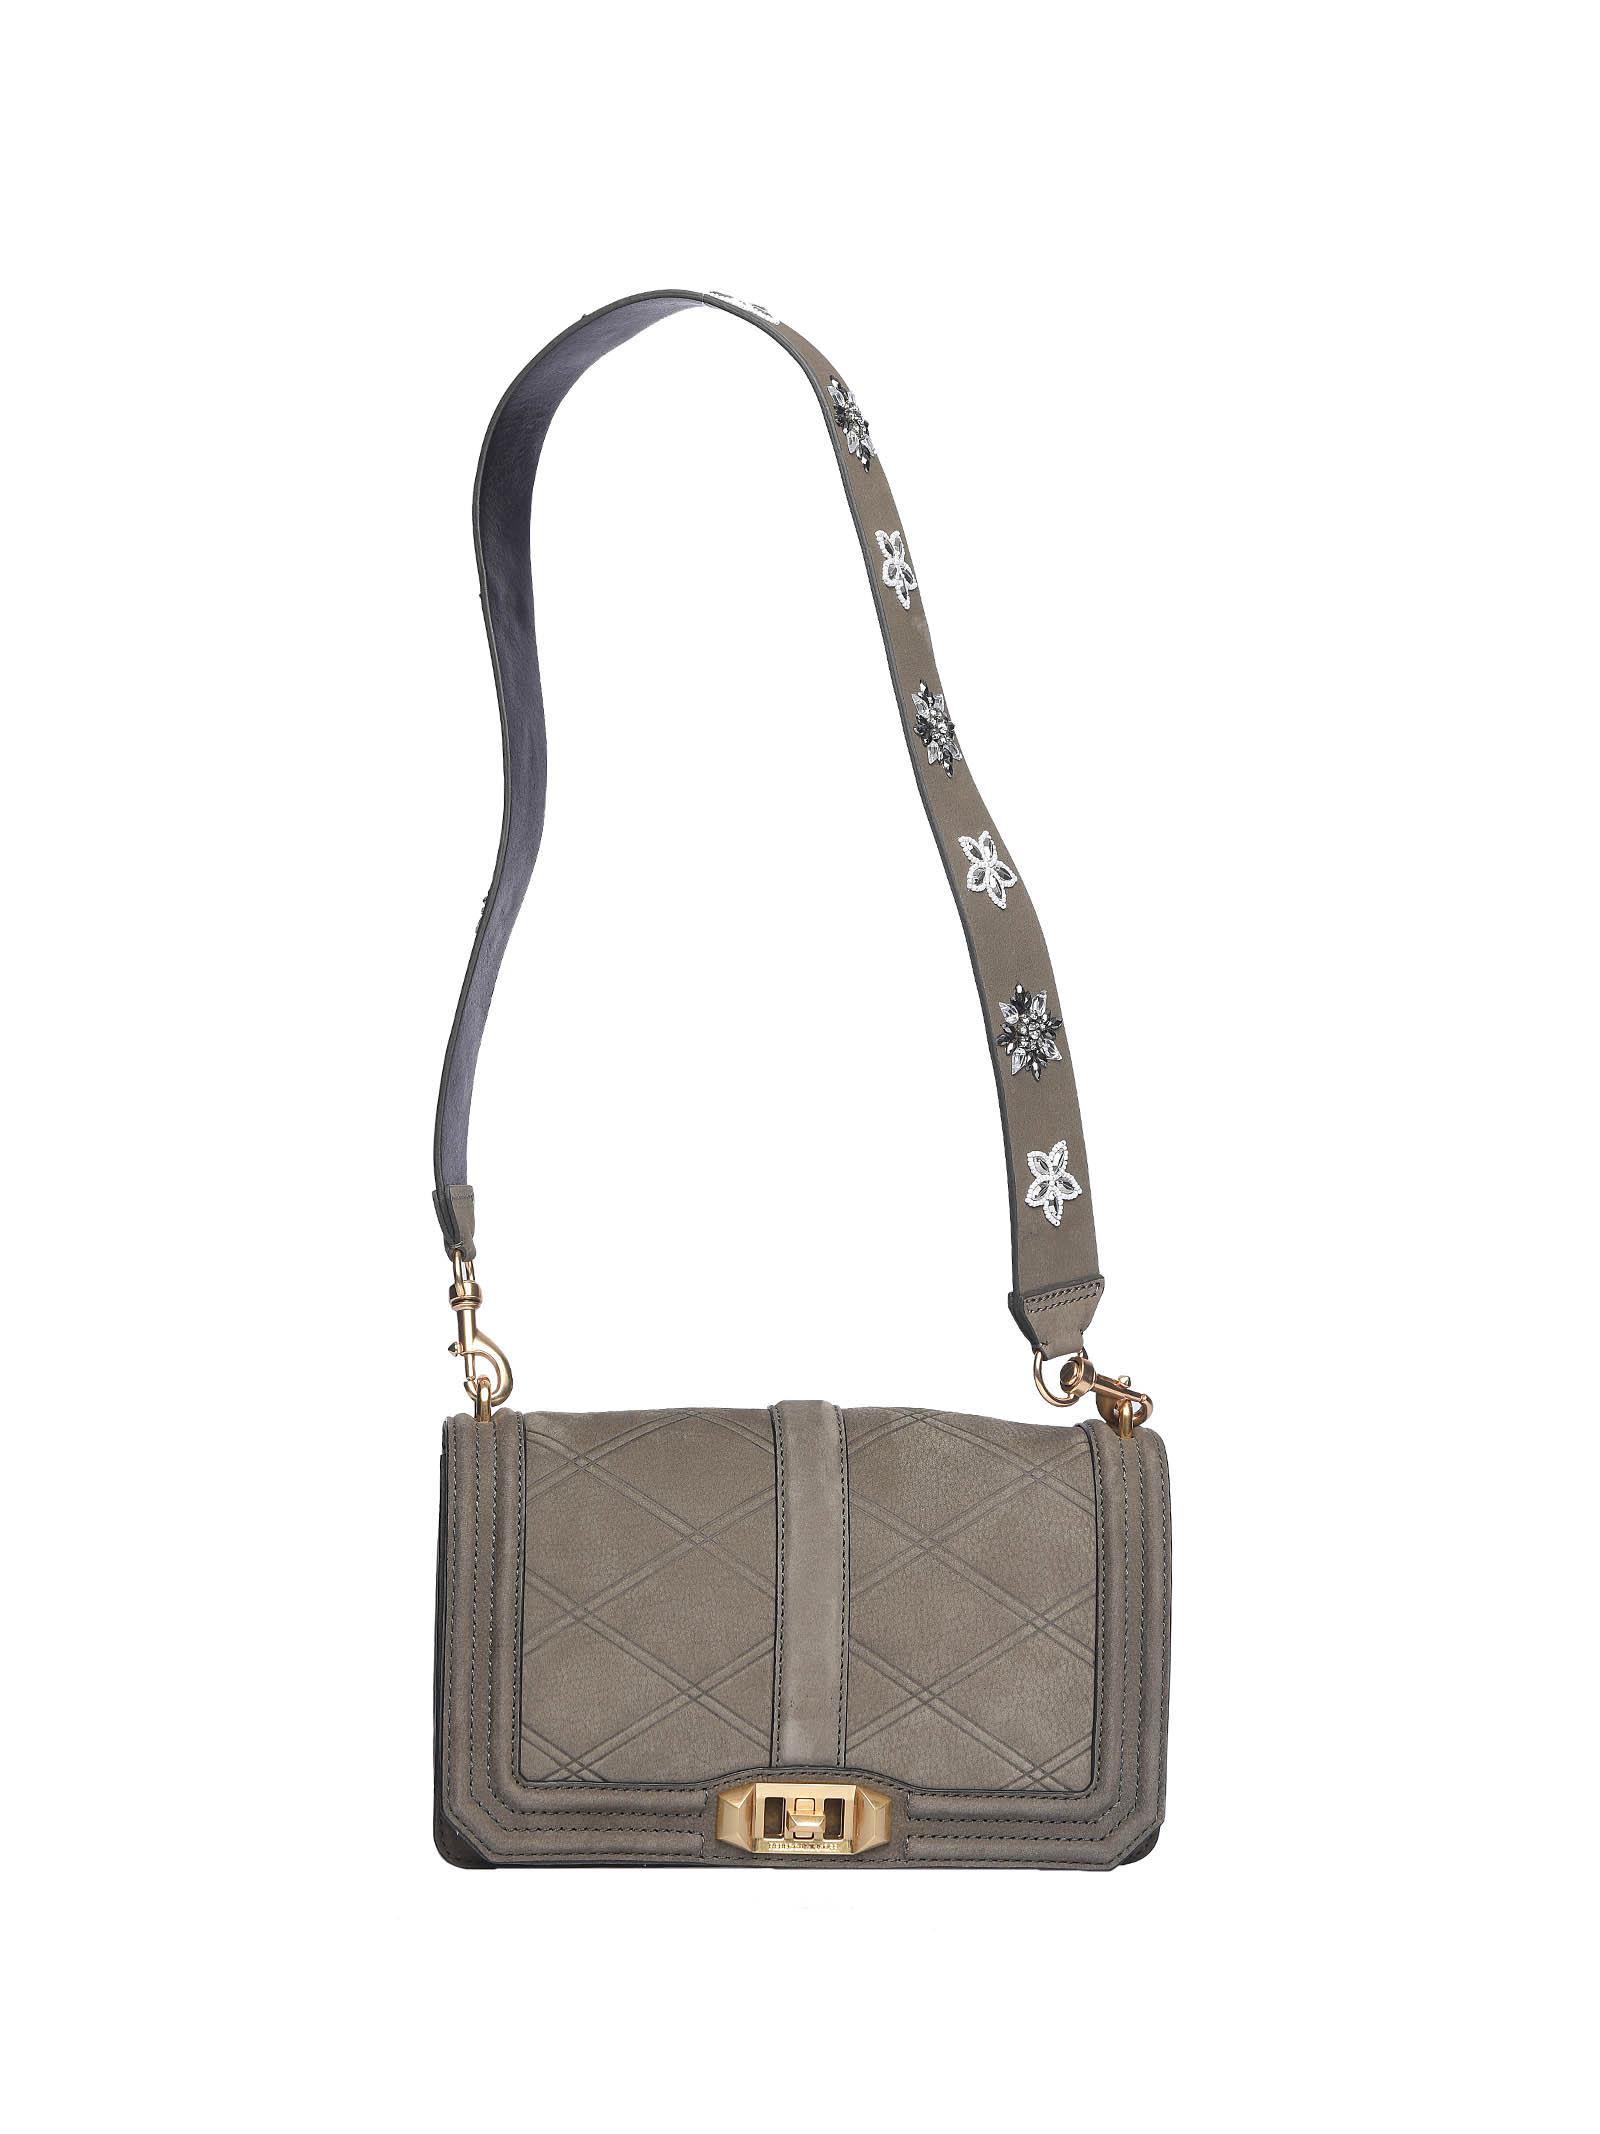 Rebecca Minkoff Love Crossbody Shoulder Bag